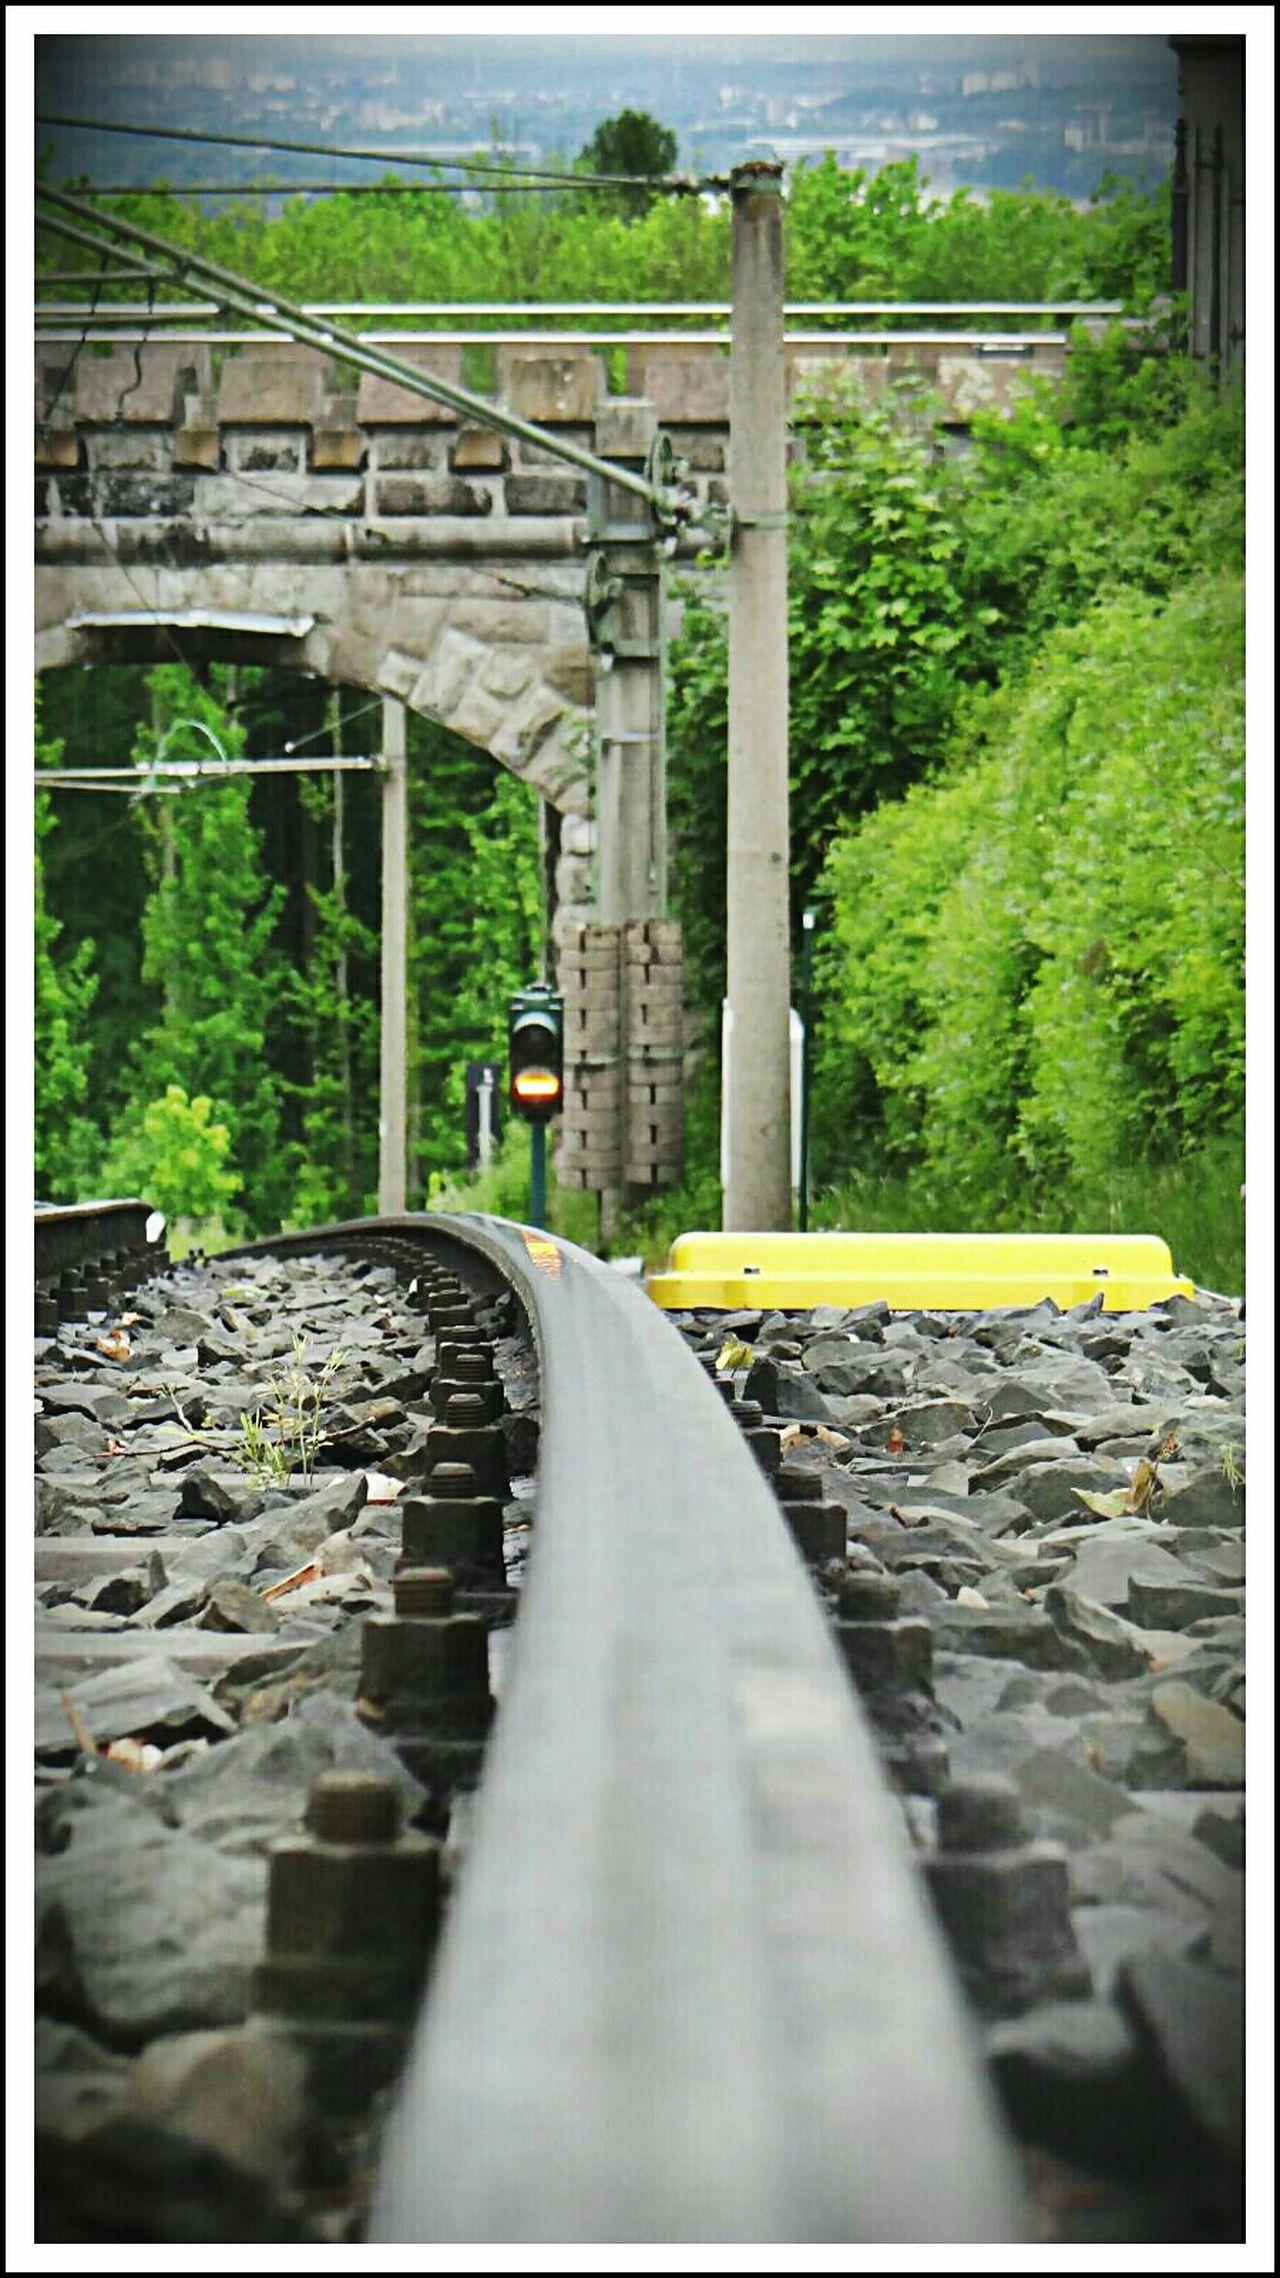 Drachenfelsbahn Drachenfels Königswinter Rhein Technik  Historical Place Outdoor Photography No People Zahnradbahn